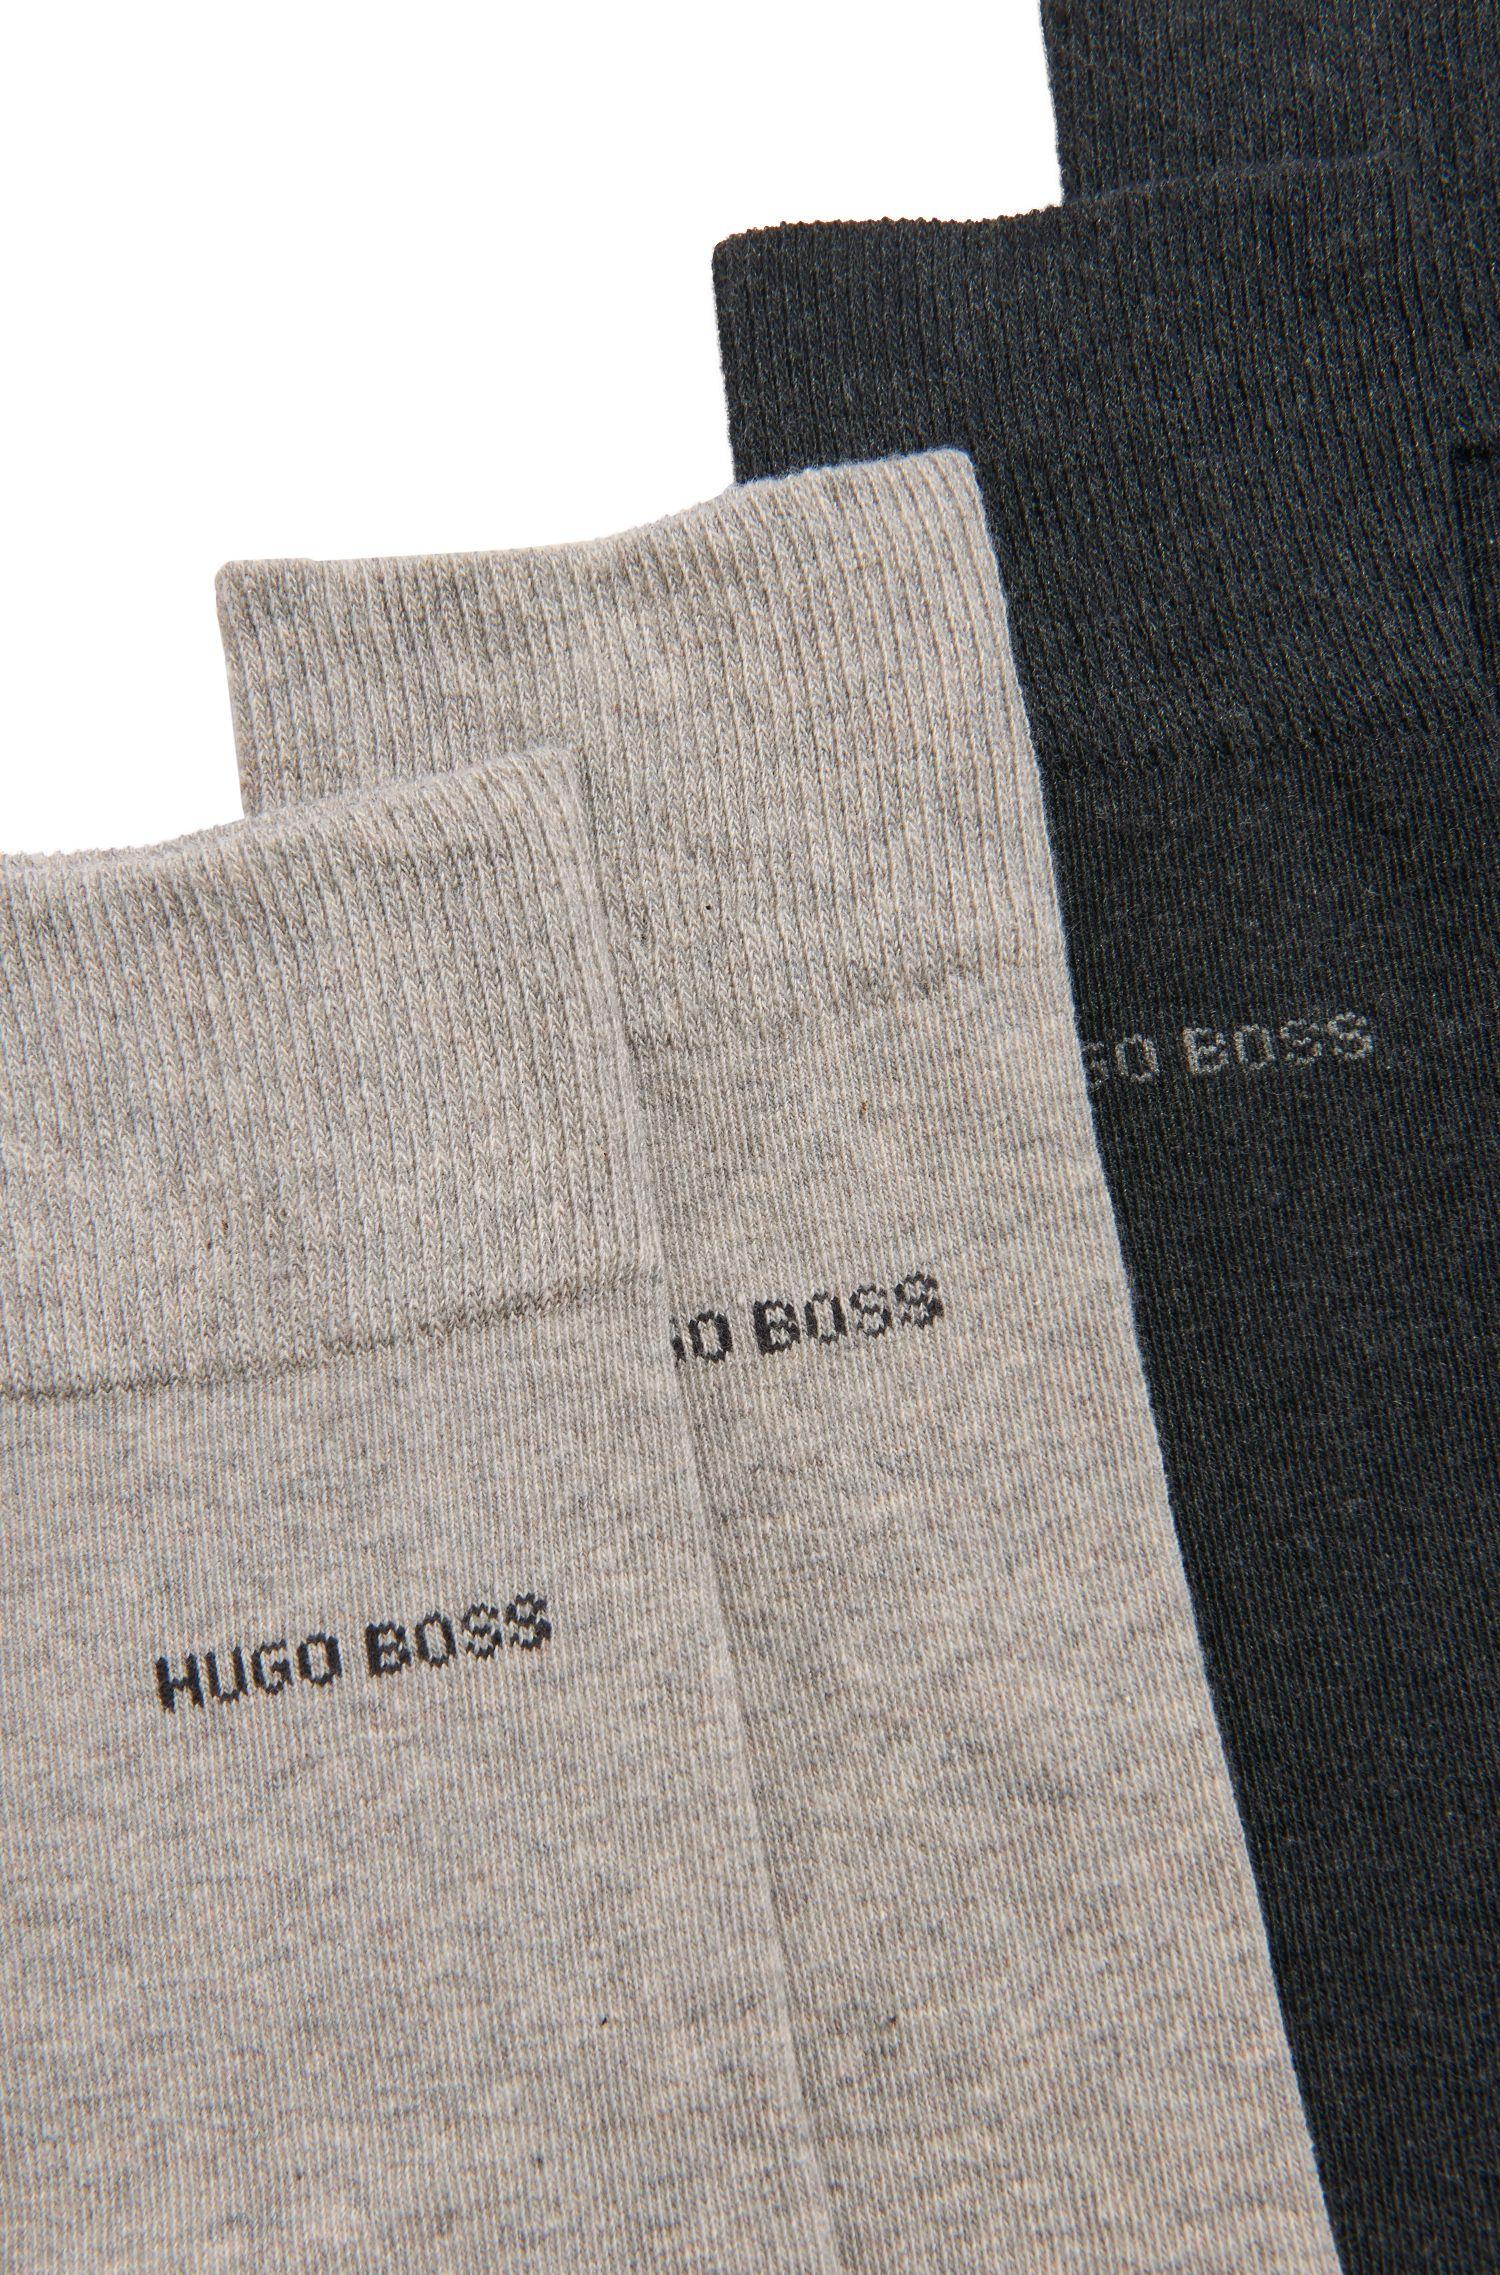 Stretch Cotton Socks Gift Set | 4P RS Gift Set US CC, Patterned